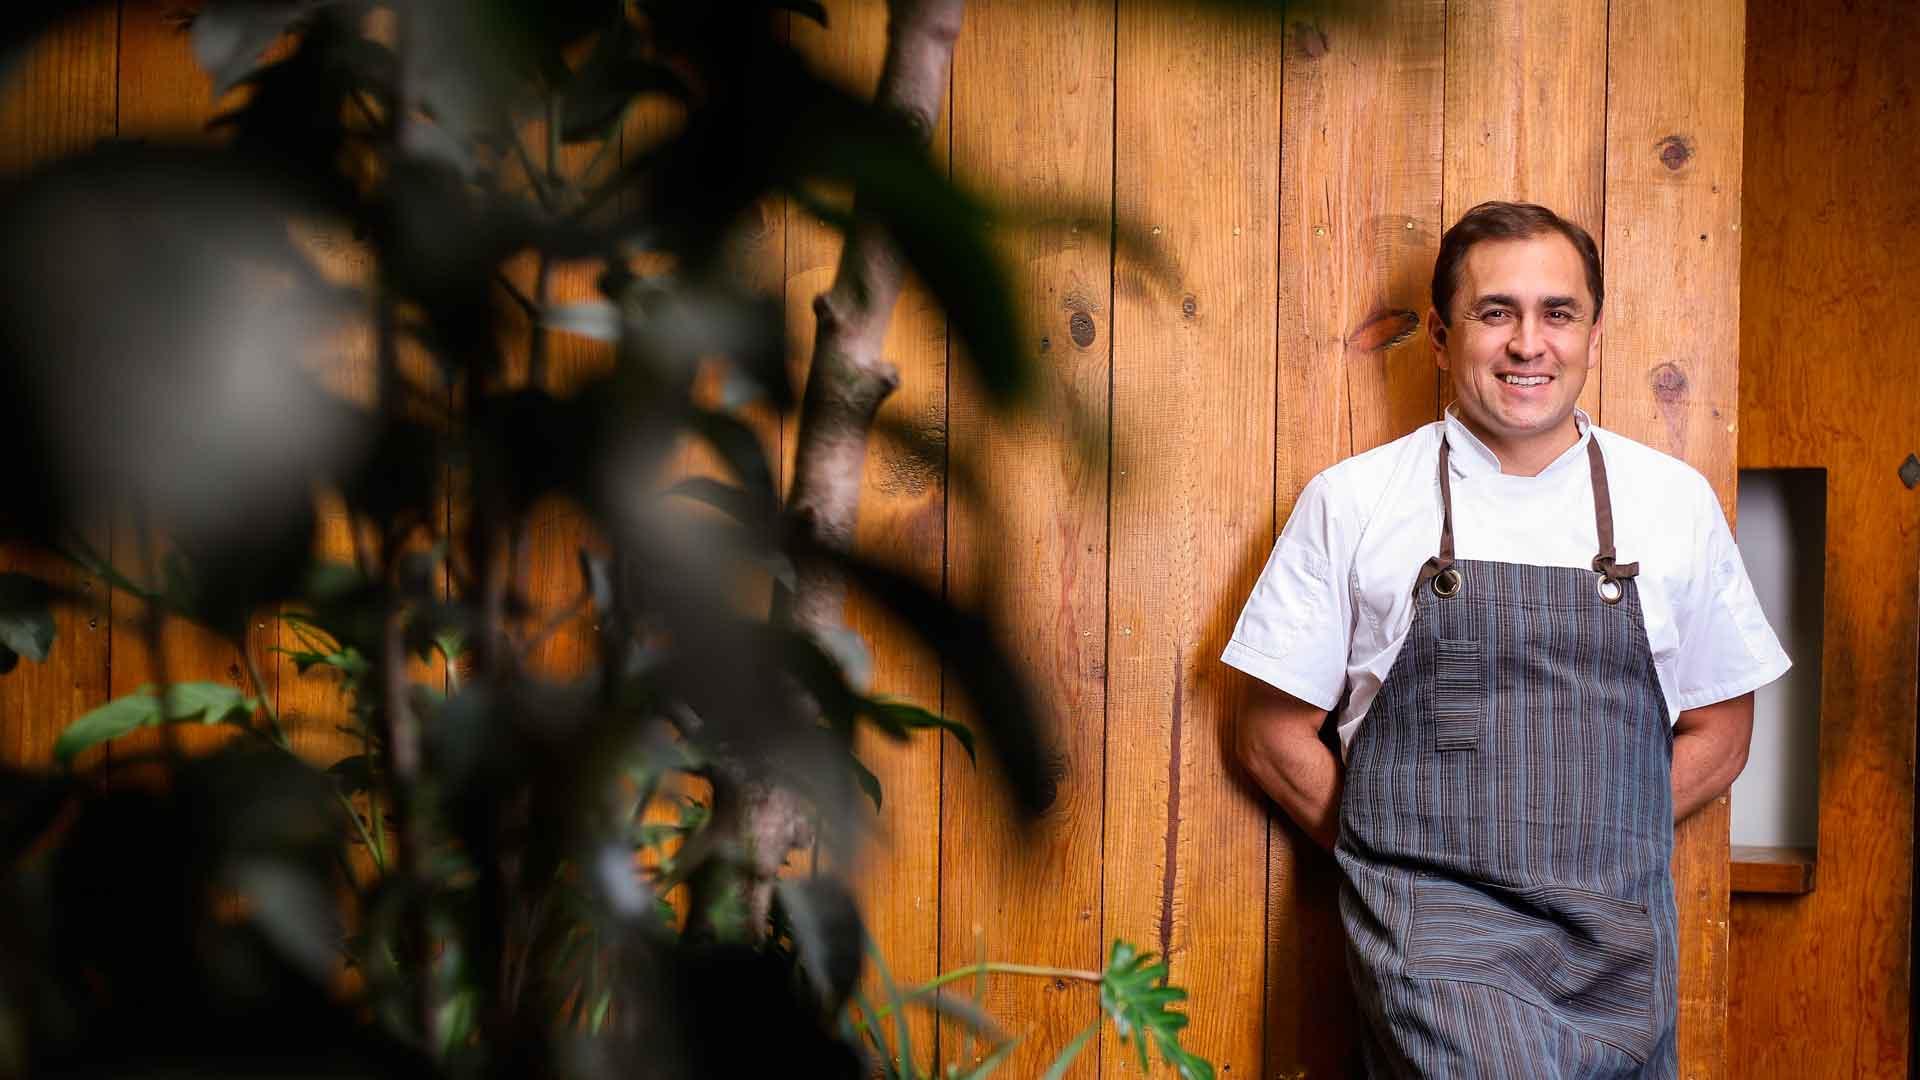 Chef Maycoll Calderón